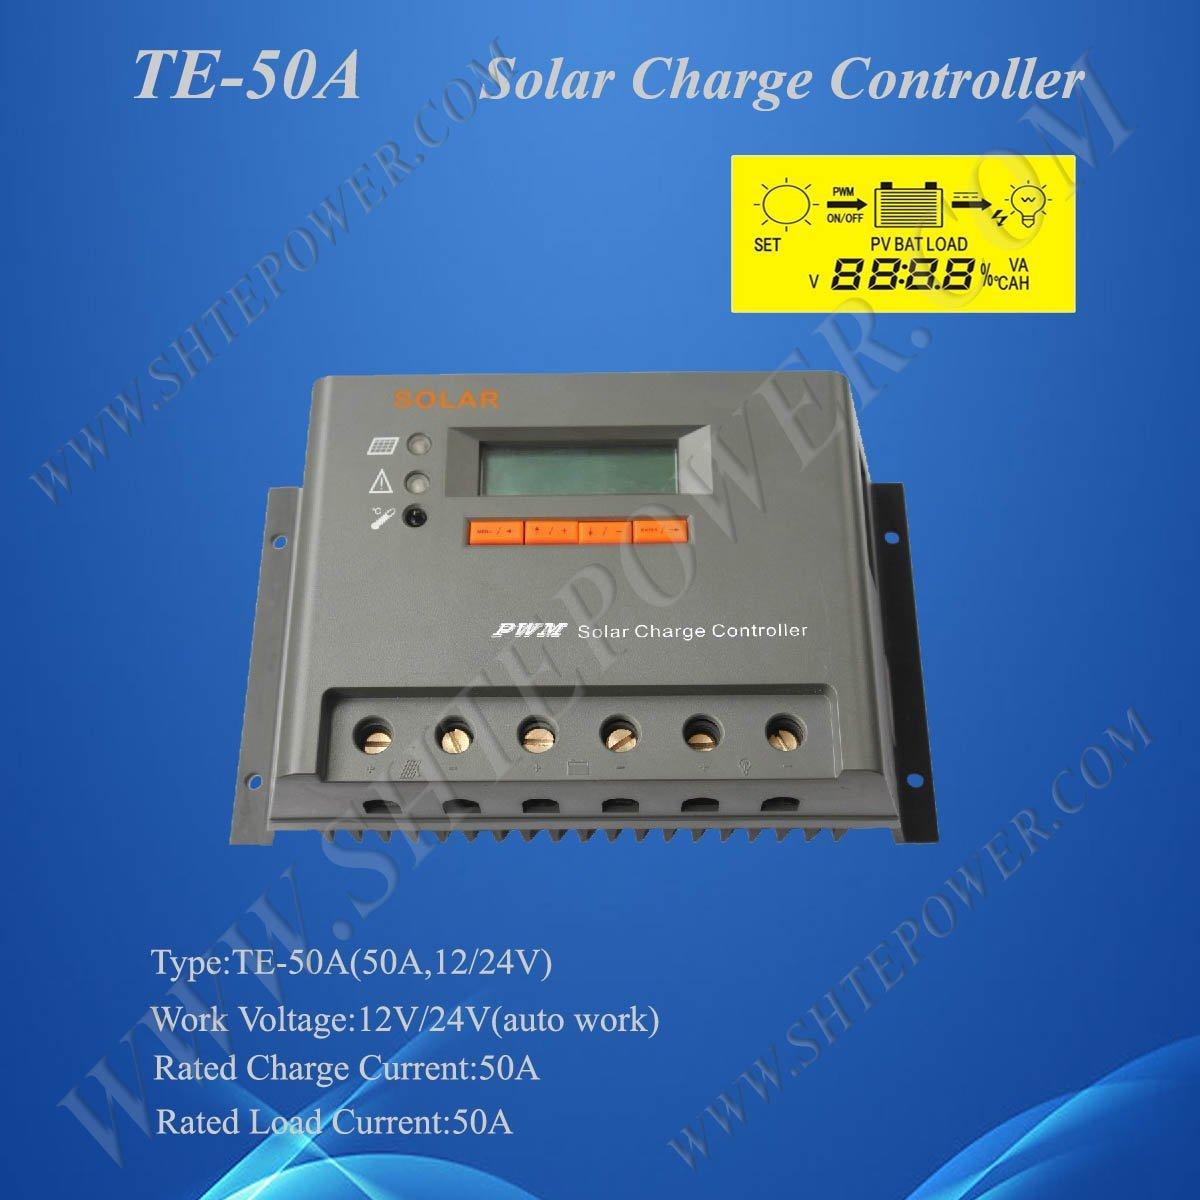 50A Солнечный свет контроллер, солнечный Батарея контроллер/регулятор 12 В/24 В авто работа